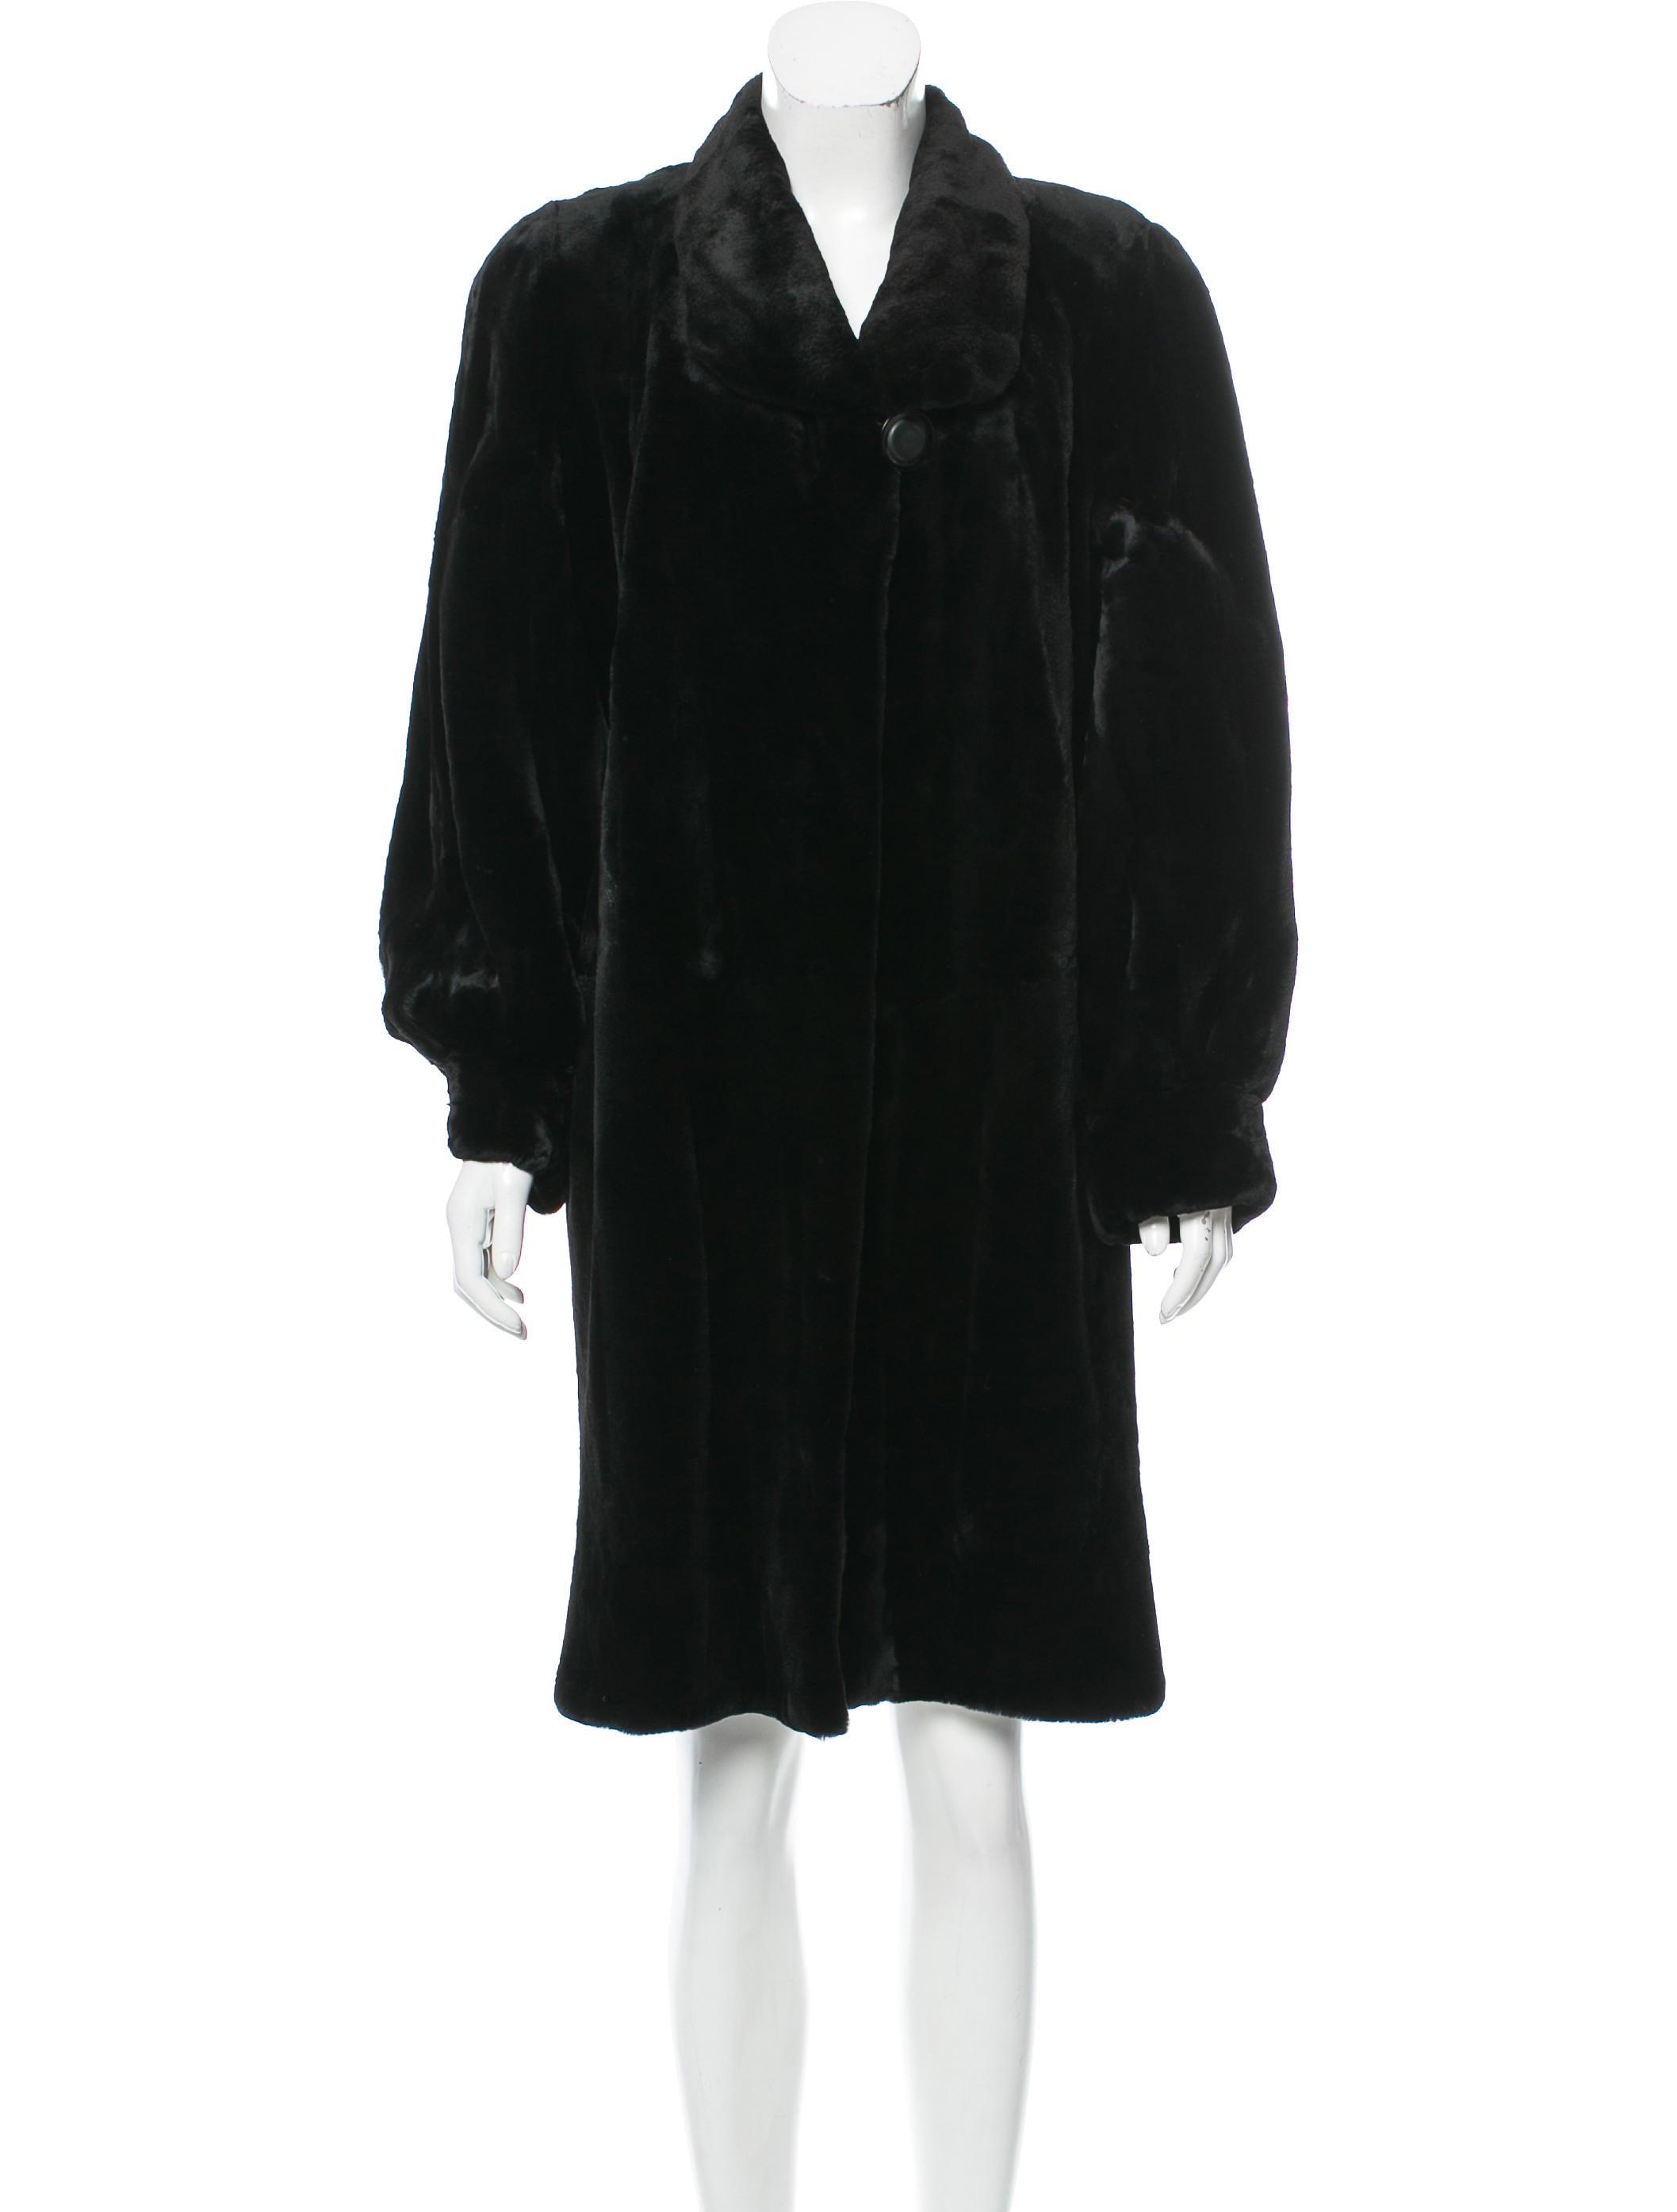 Fur Sheared Mink Coat Clothing Fur22178 The Realreal